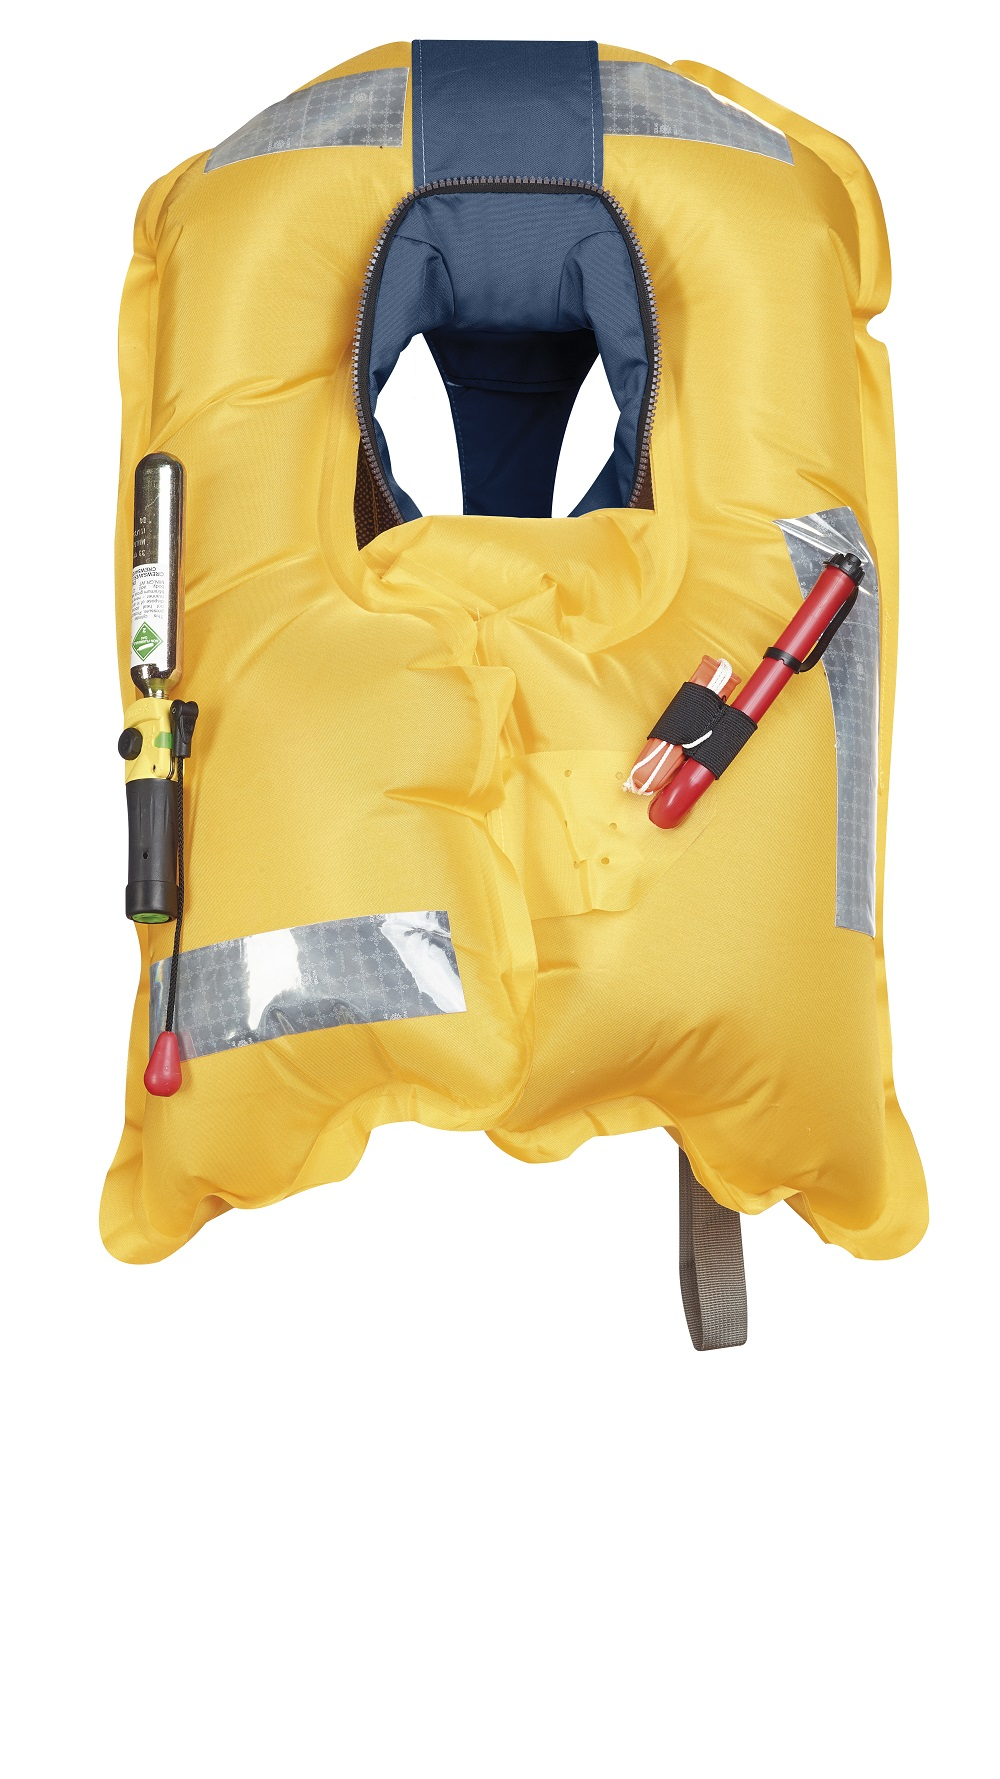 Crewsaver Crewfit 165n Sport Lifejacket Manual Navy Dale Sailing Maclube Electric Fuel Pump Instruction Sheet 2471